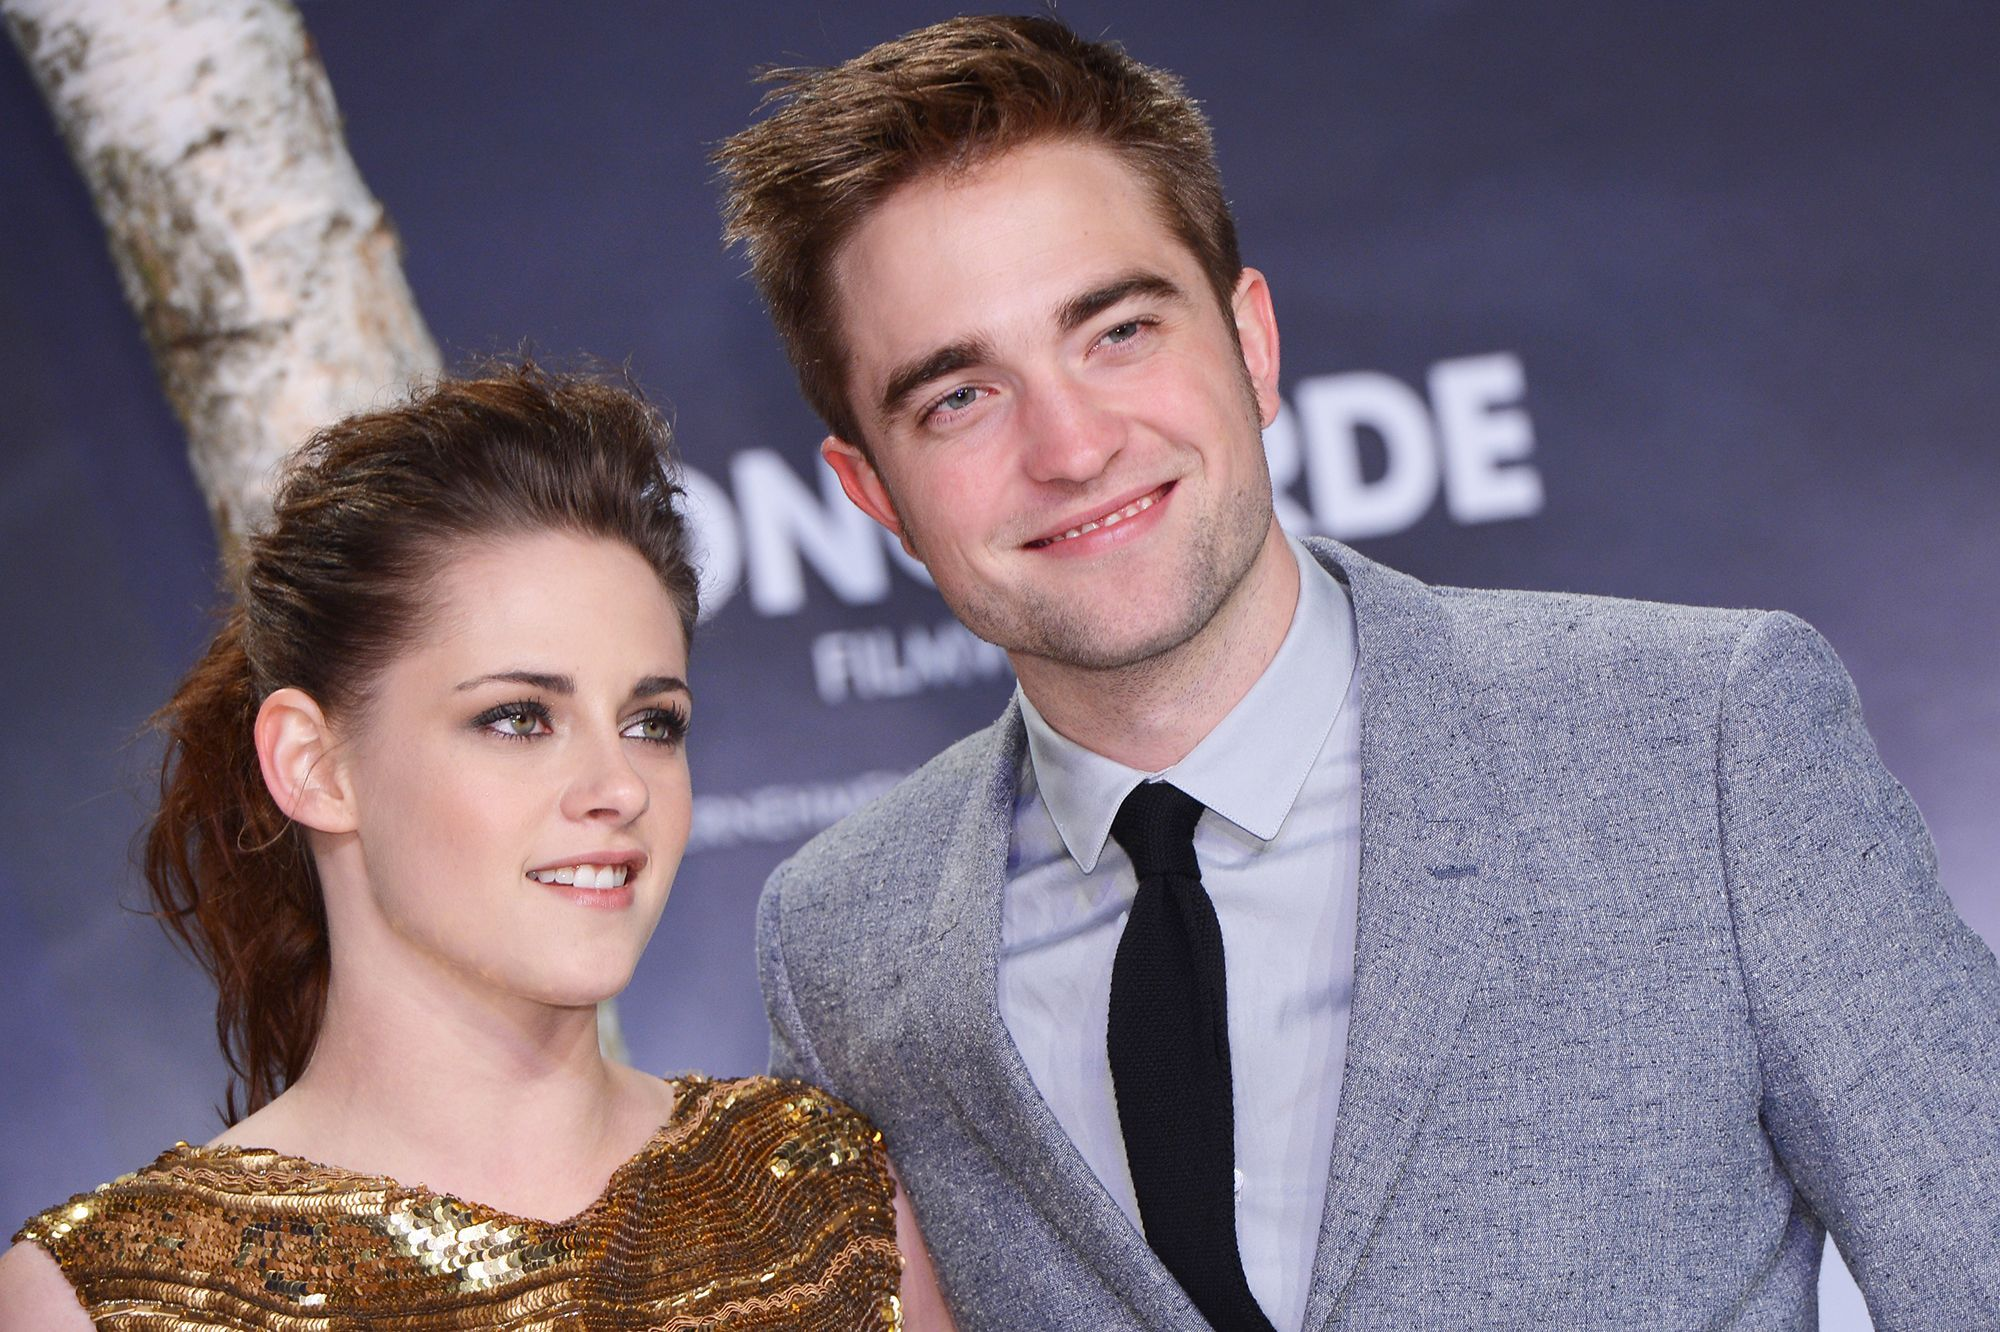 Jennifer Lawrence datation Robert Pattinson datation ADN Inc